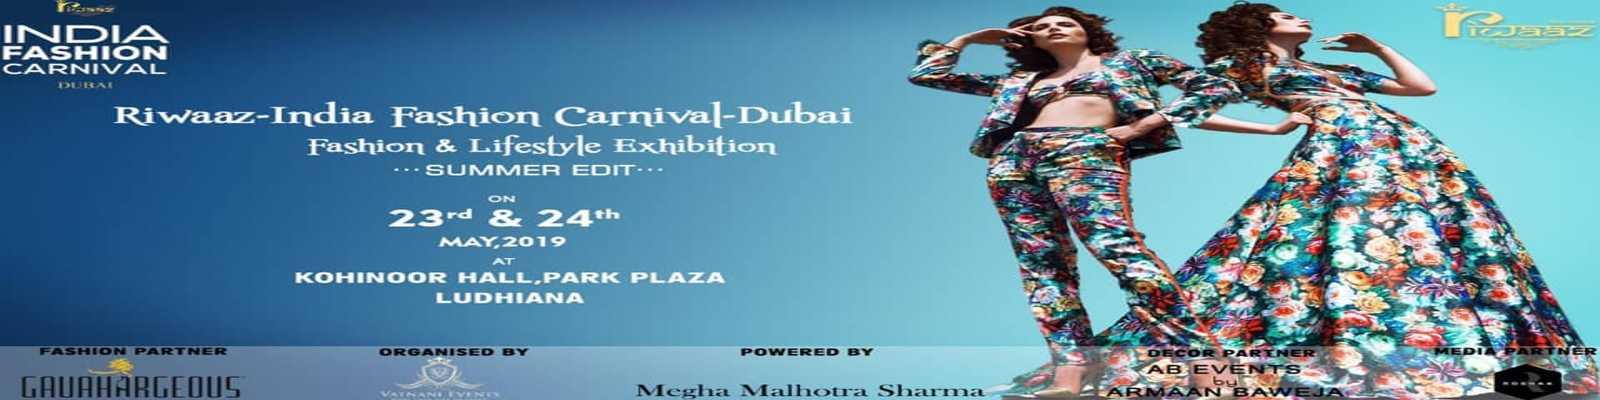 Riwaaz - India Fashion Carnival - Ludhiana - Citywoofer